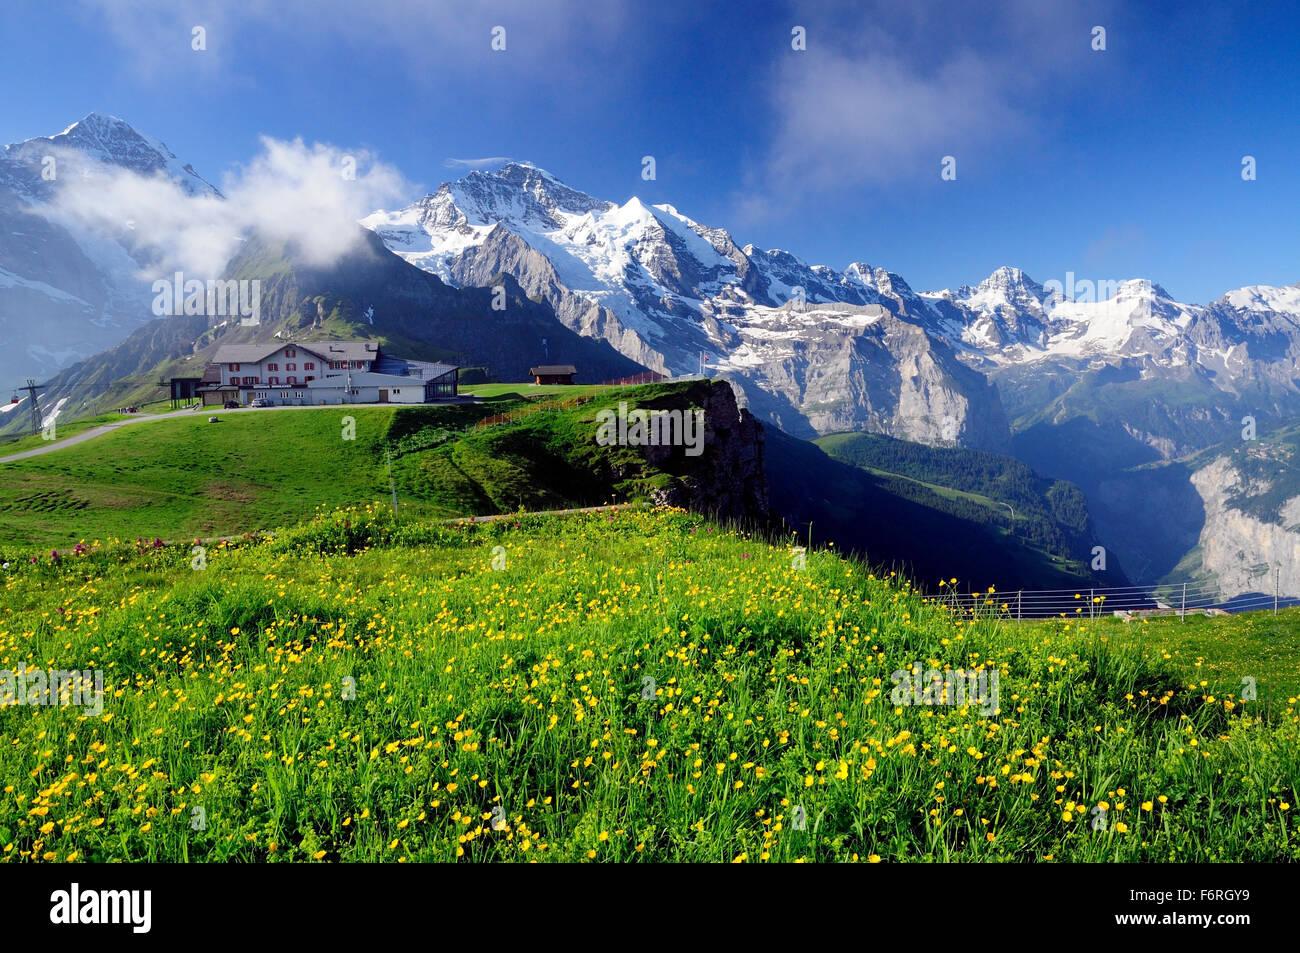 Alpine panorama above Berghaus Mannlichen and the Lauterbrunnen valley. - Stock Image